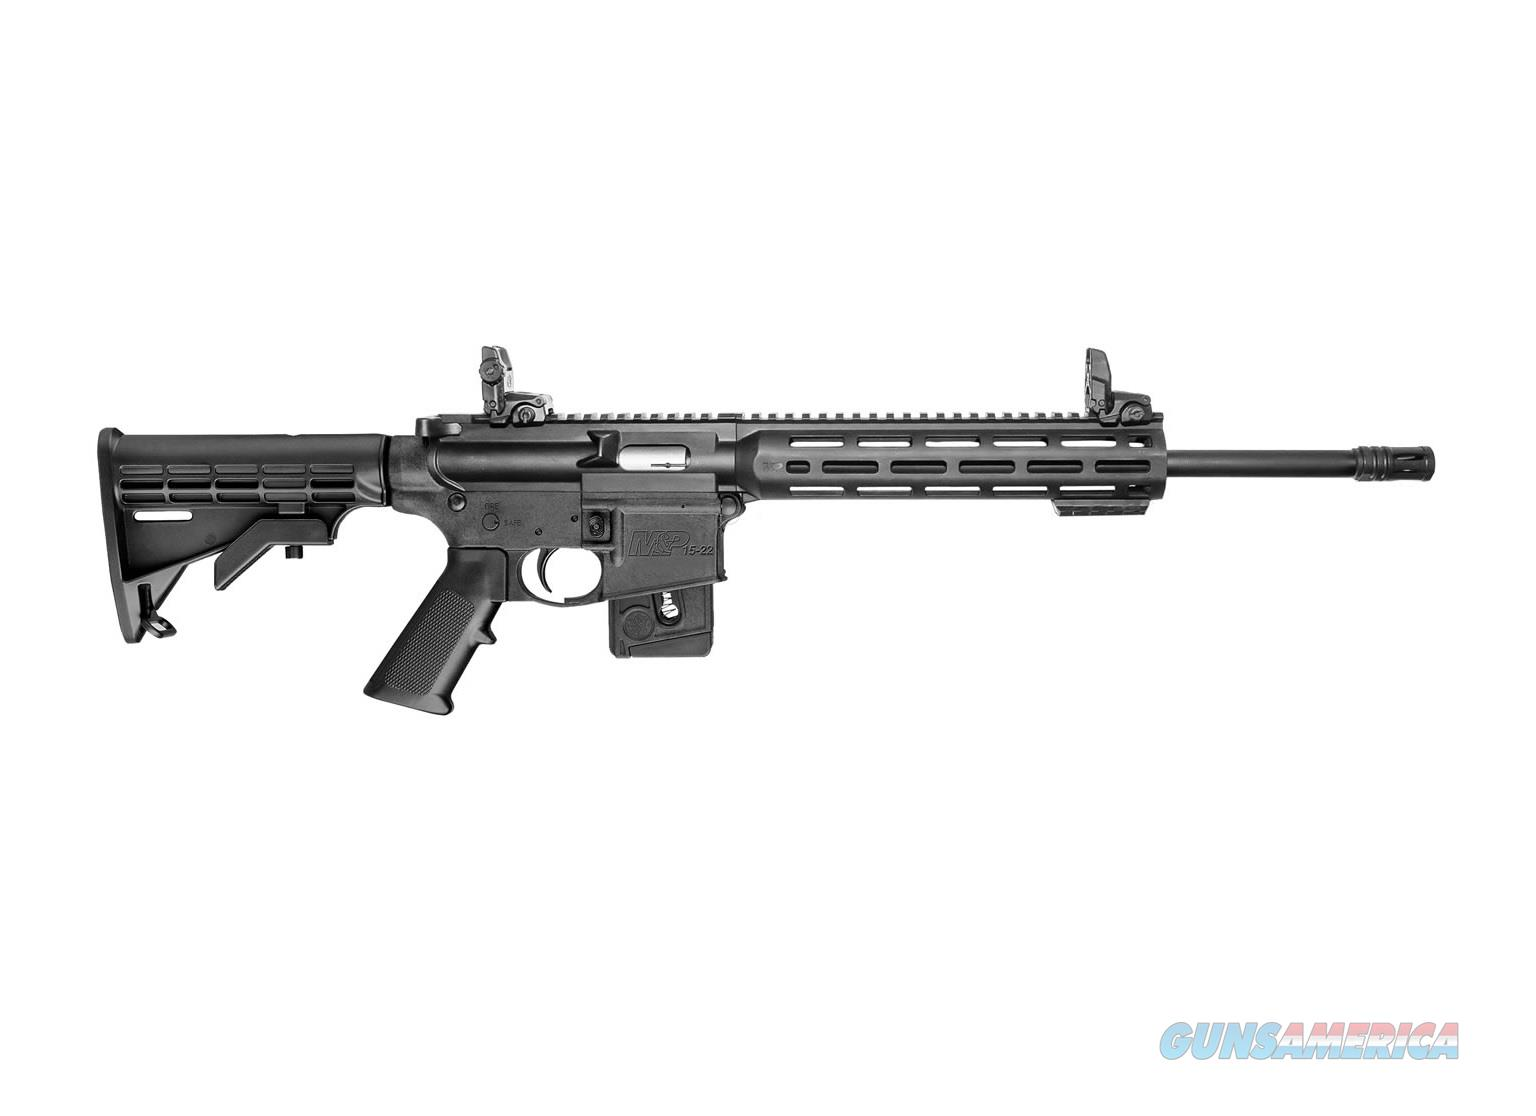 Smith & Wesson M&P 15-22 Sport M-LOK .22 LR 10rd CA COMPLIANT 10206   Guns > Rifles > Smith & Wesson Rifles > M&P